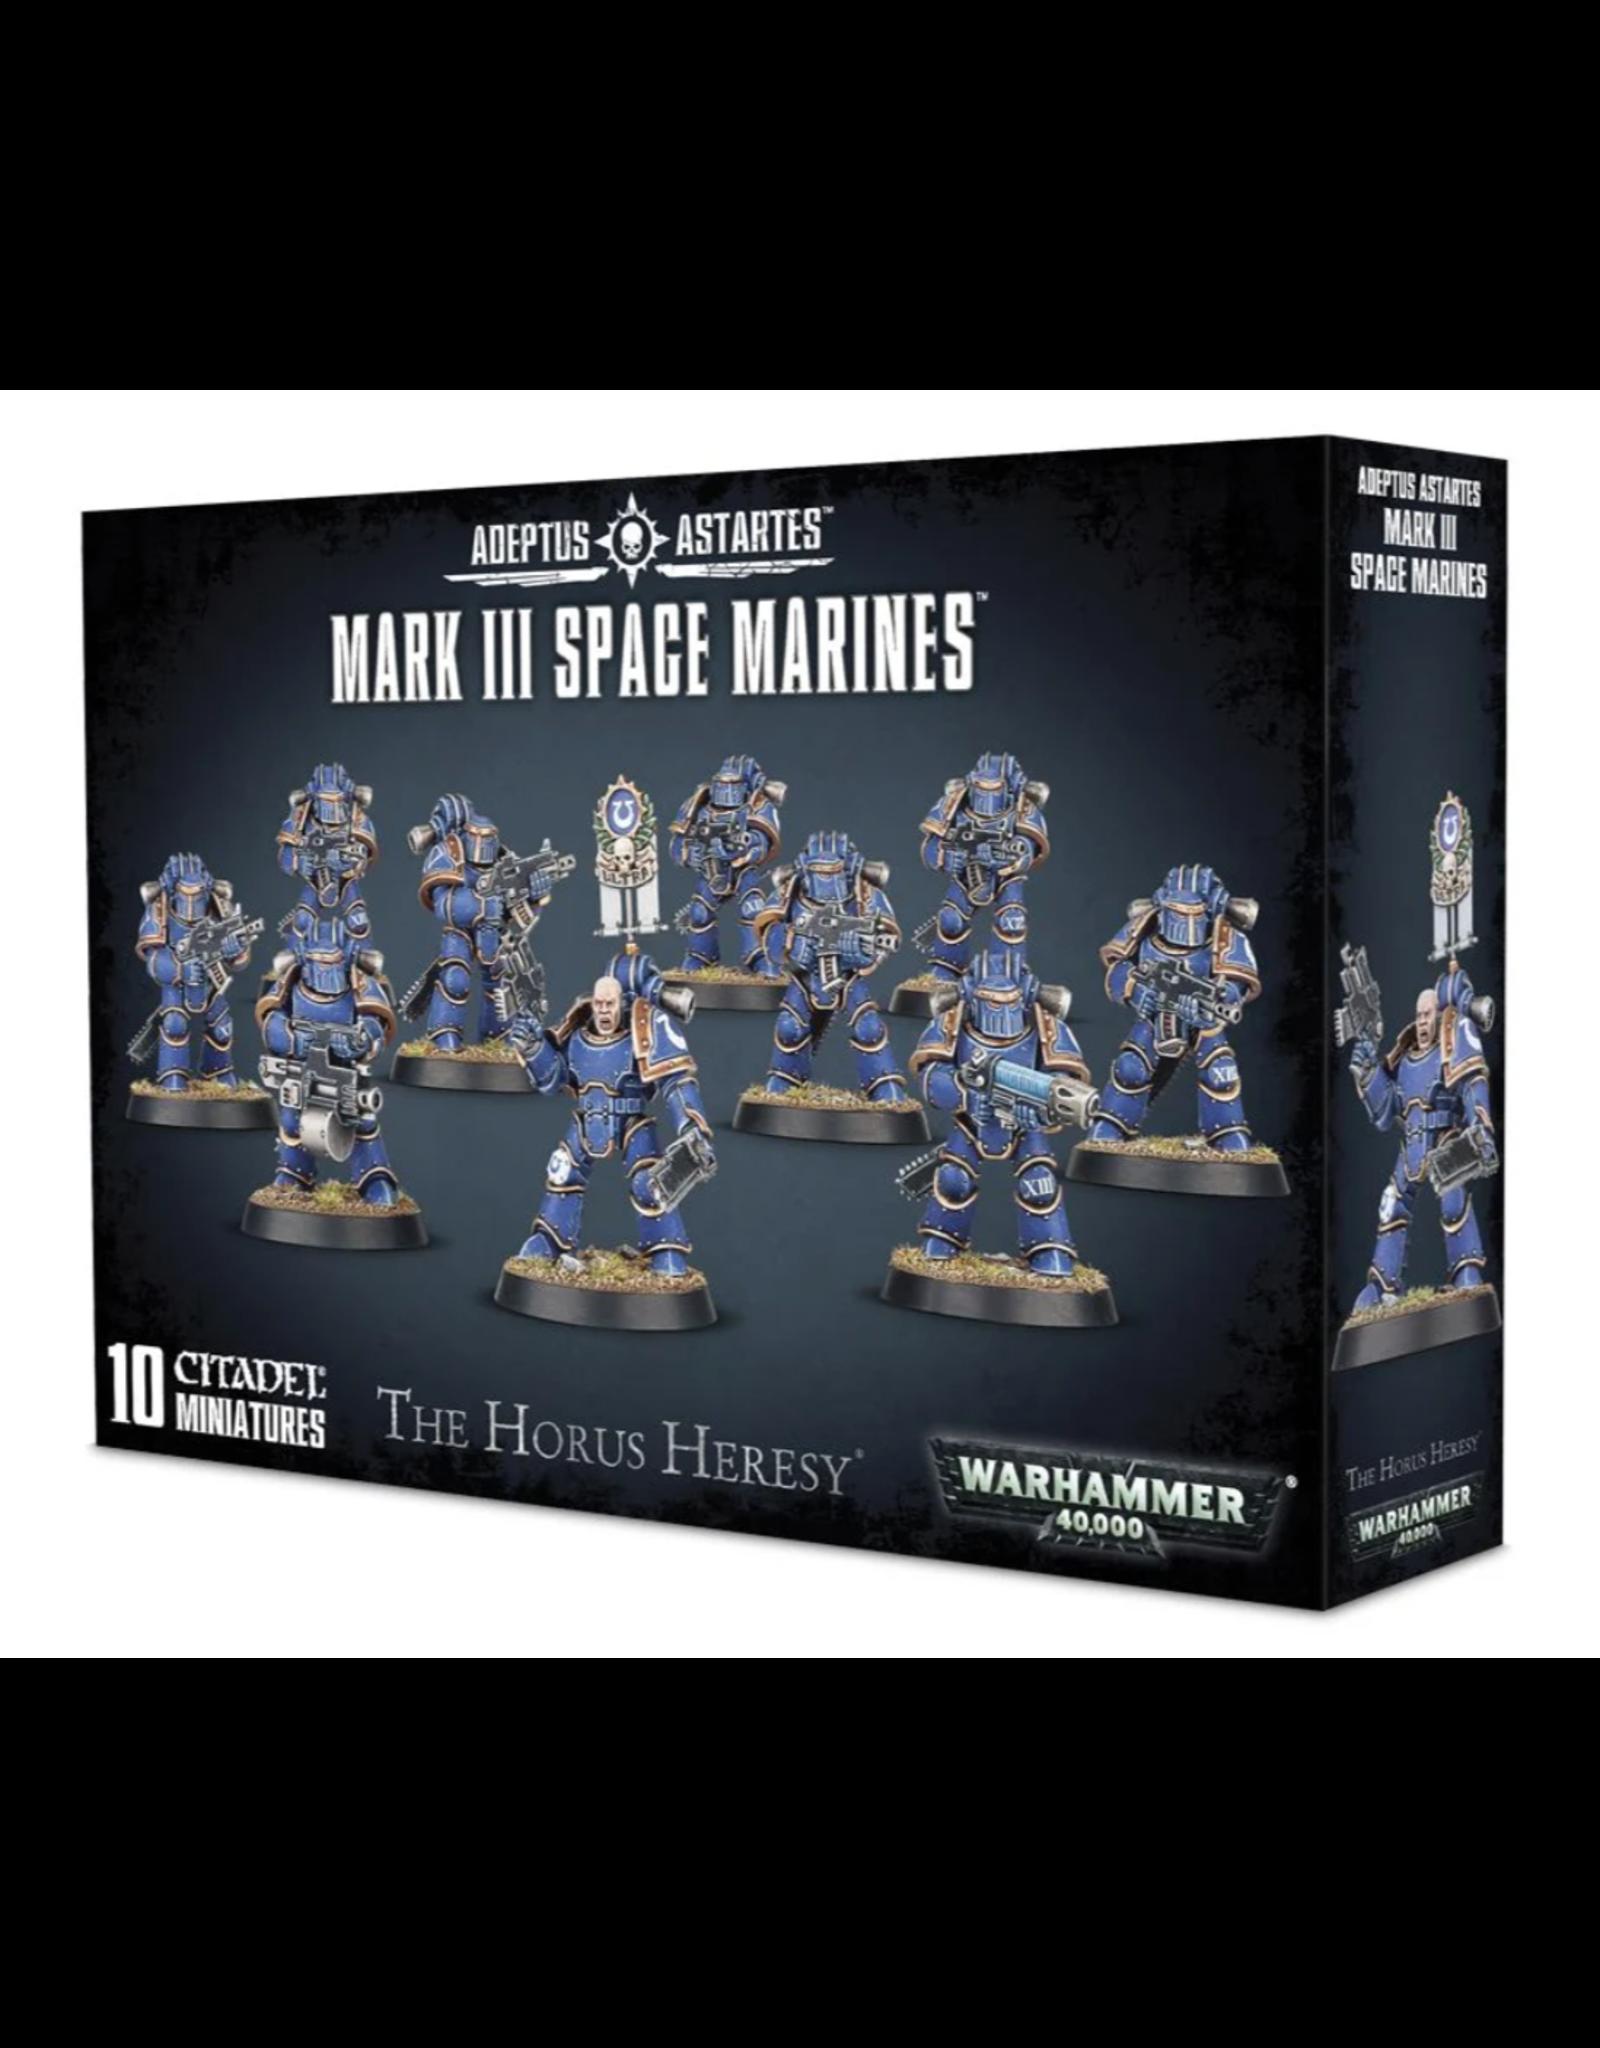 Warhammer 40K The Horus Heresy: Mark III Space Marines